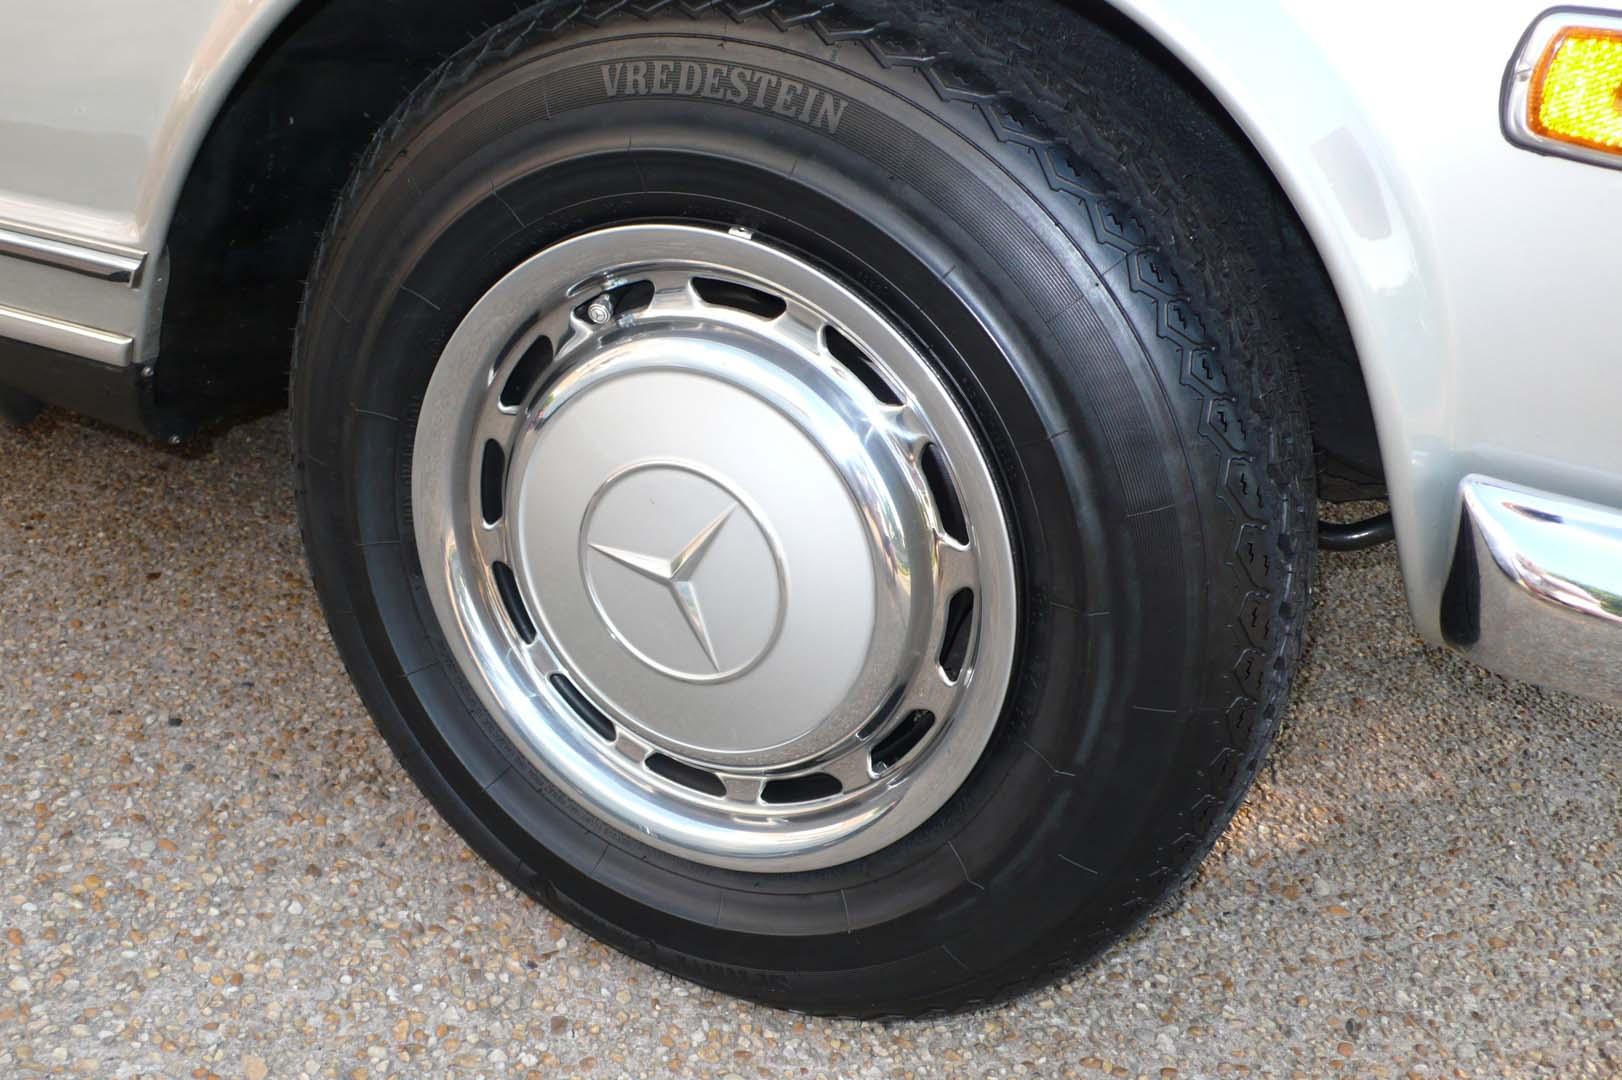 Tire Nirvana!